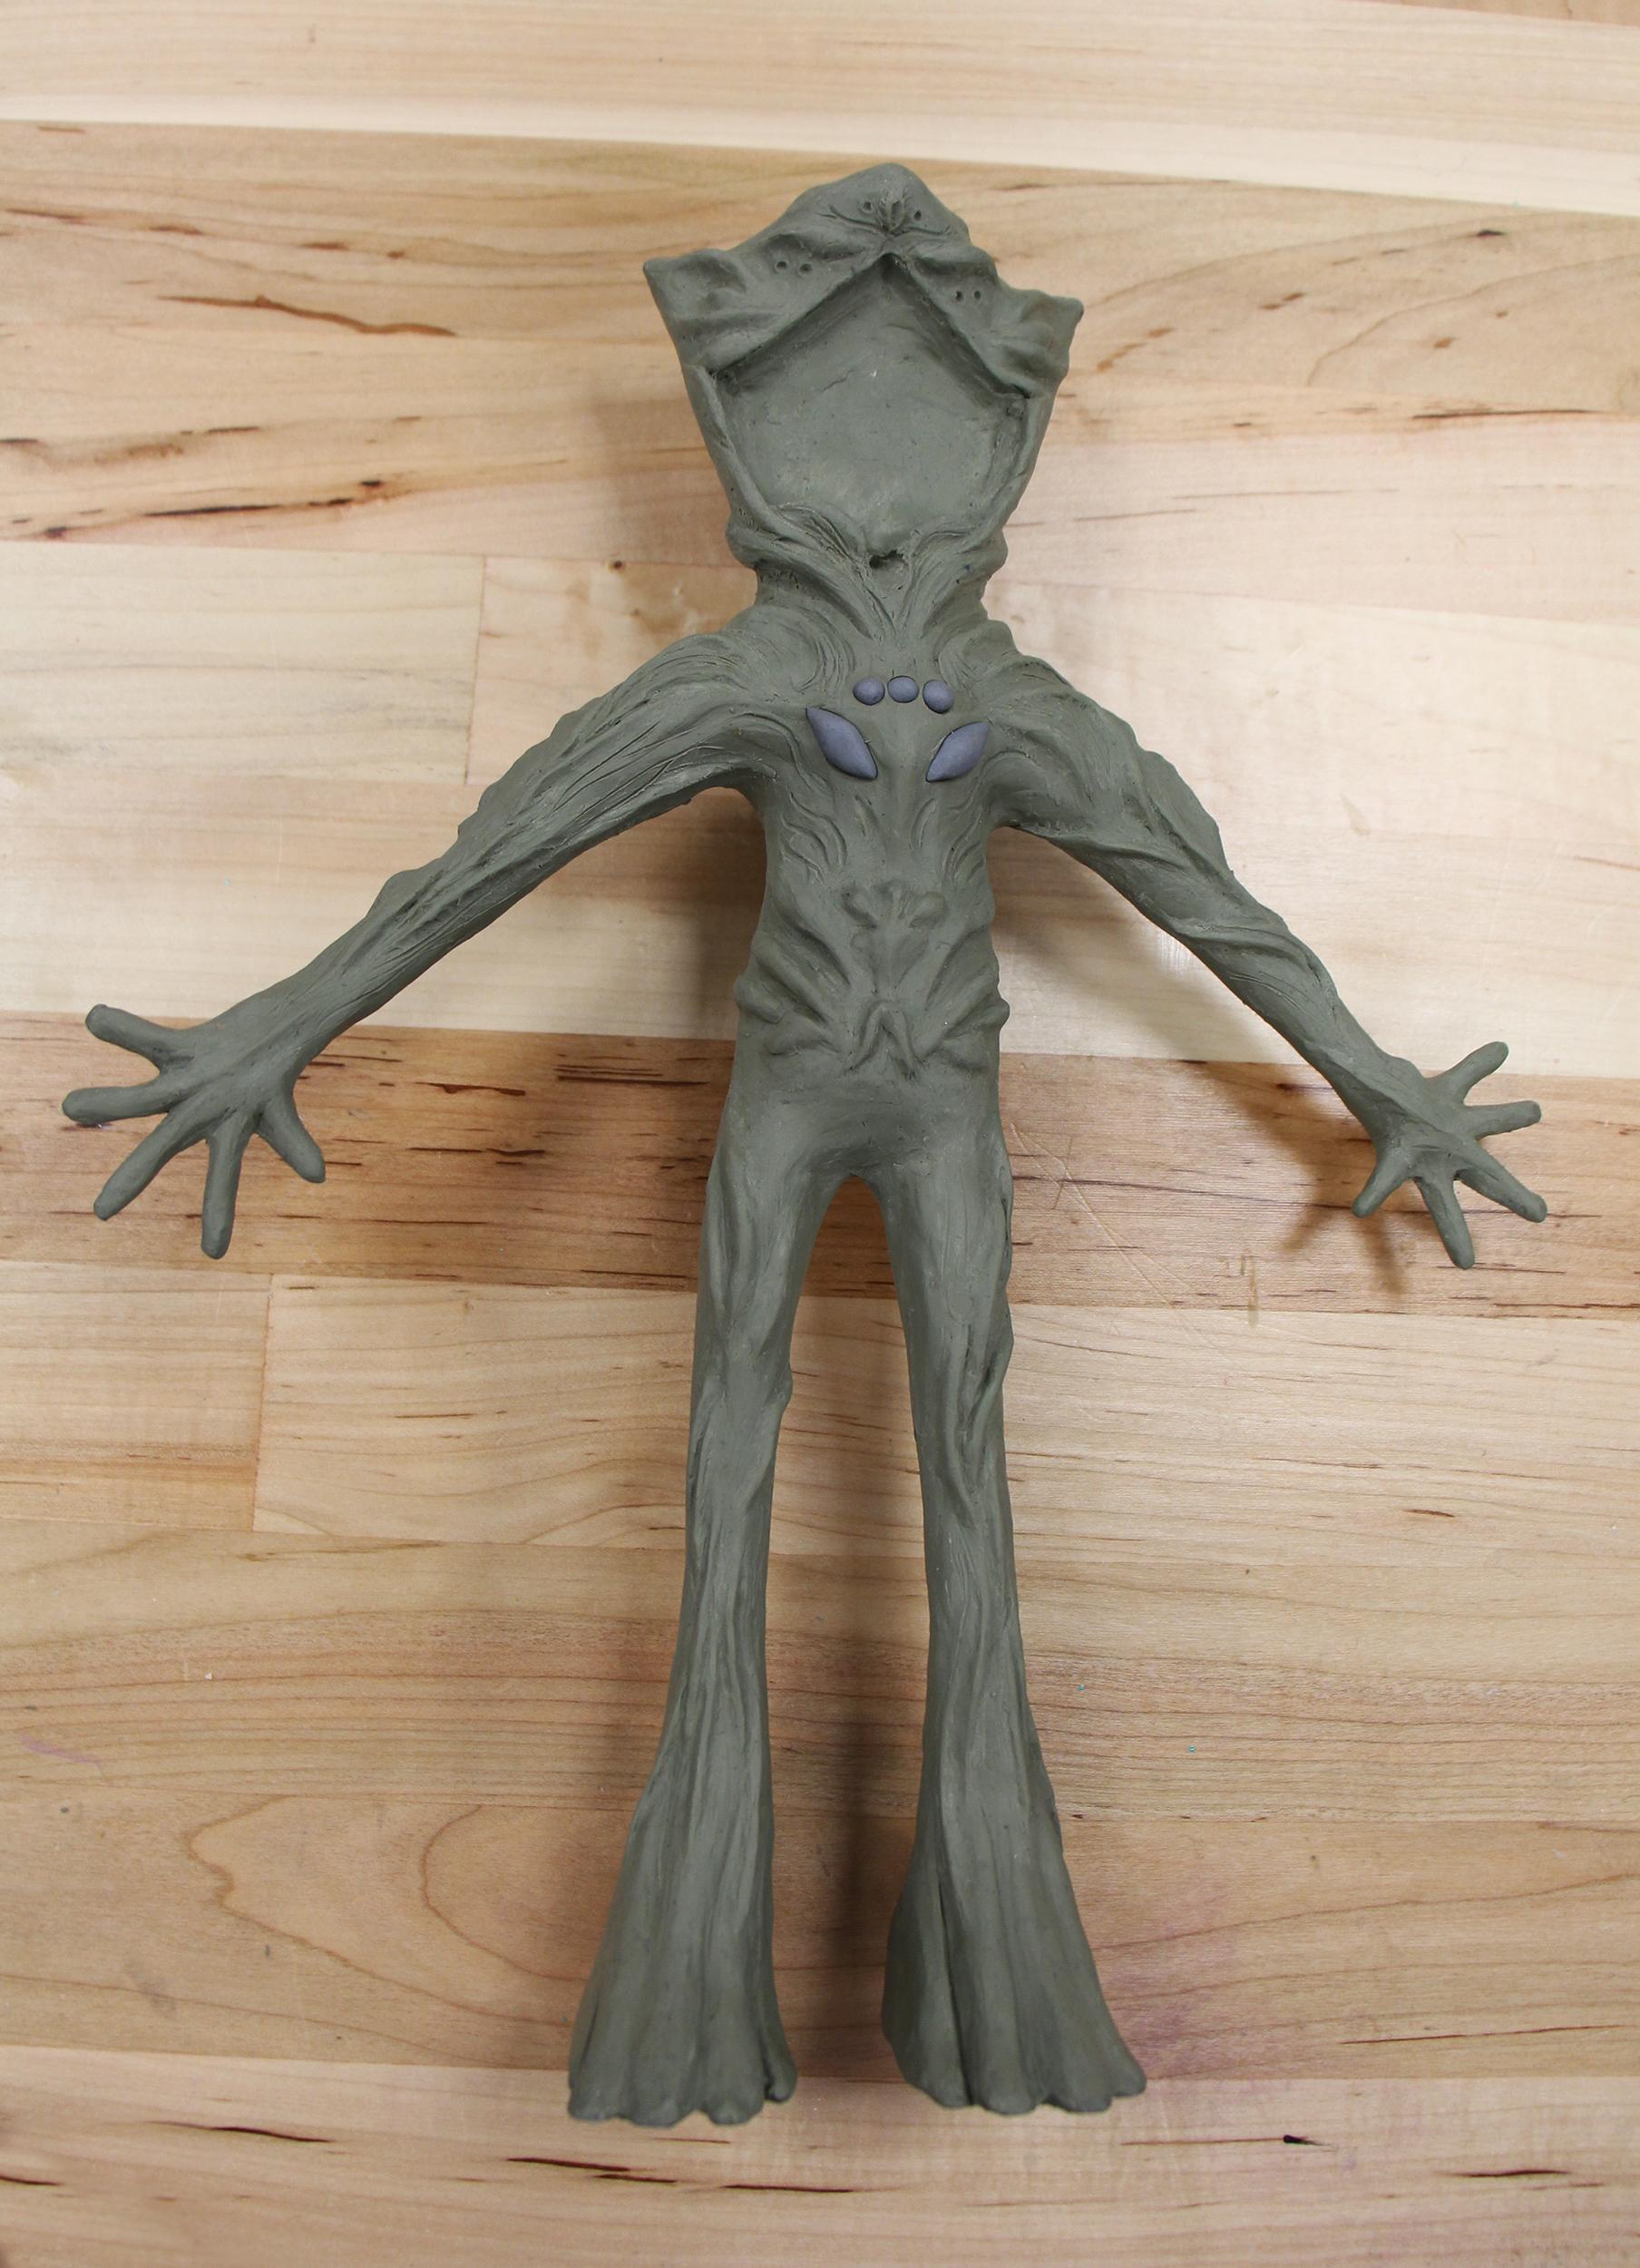 Front View of Puppet Sculpt